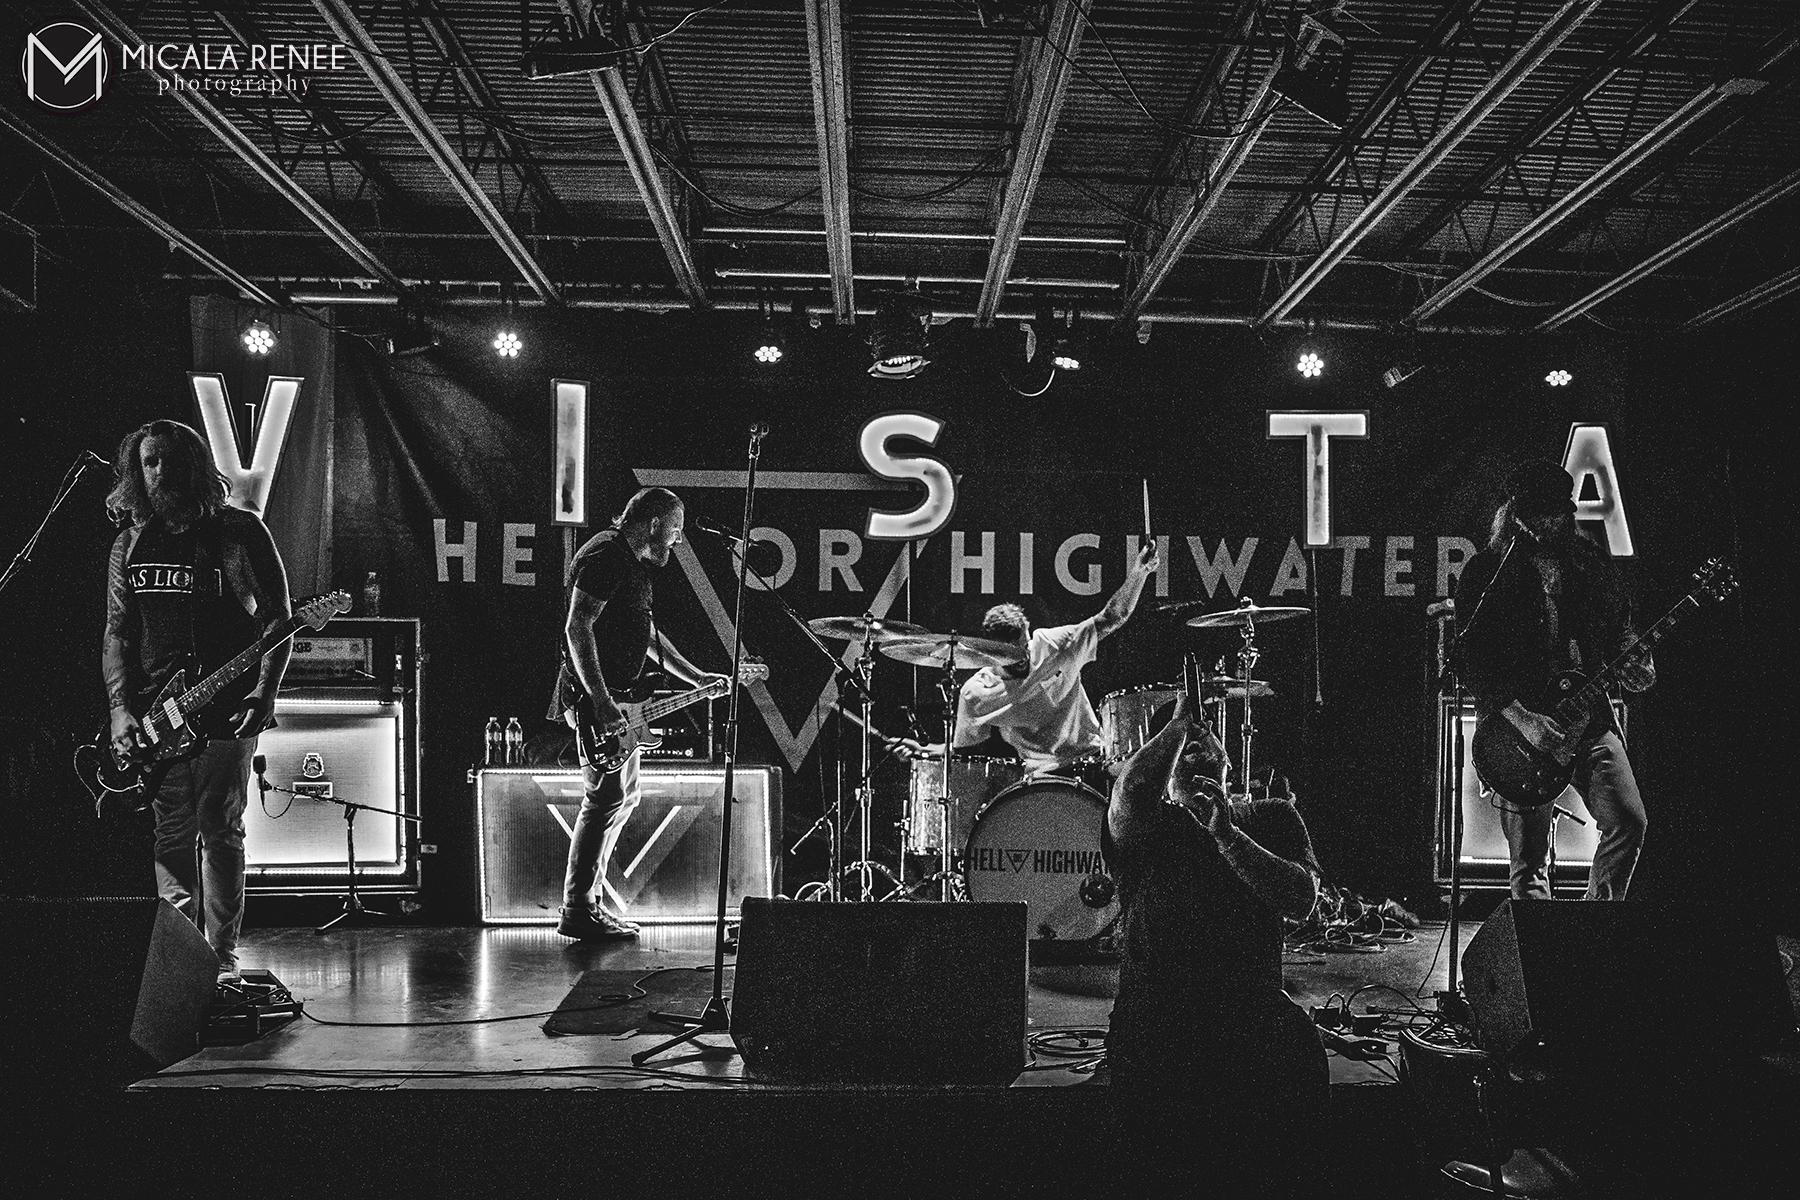 Hell Or Highwater • The Firebird • St. Louis, MO • 09.05.17